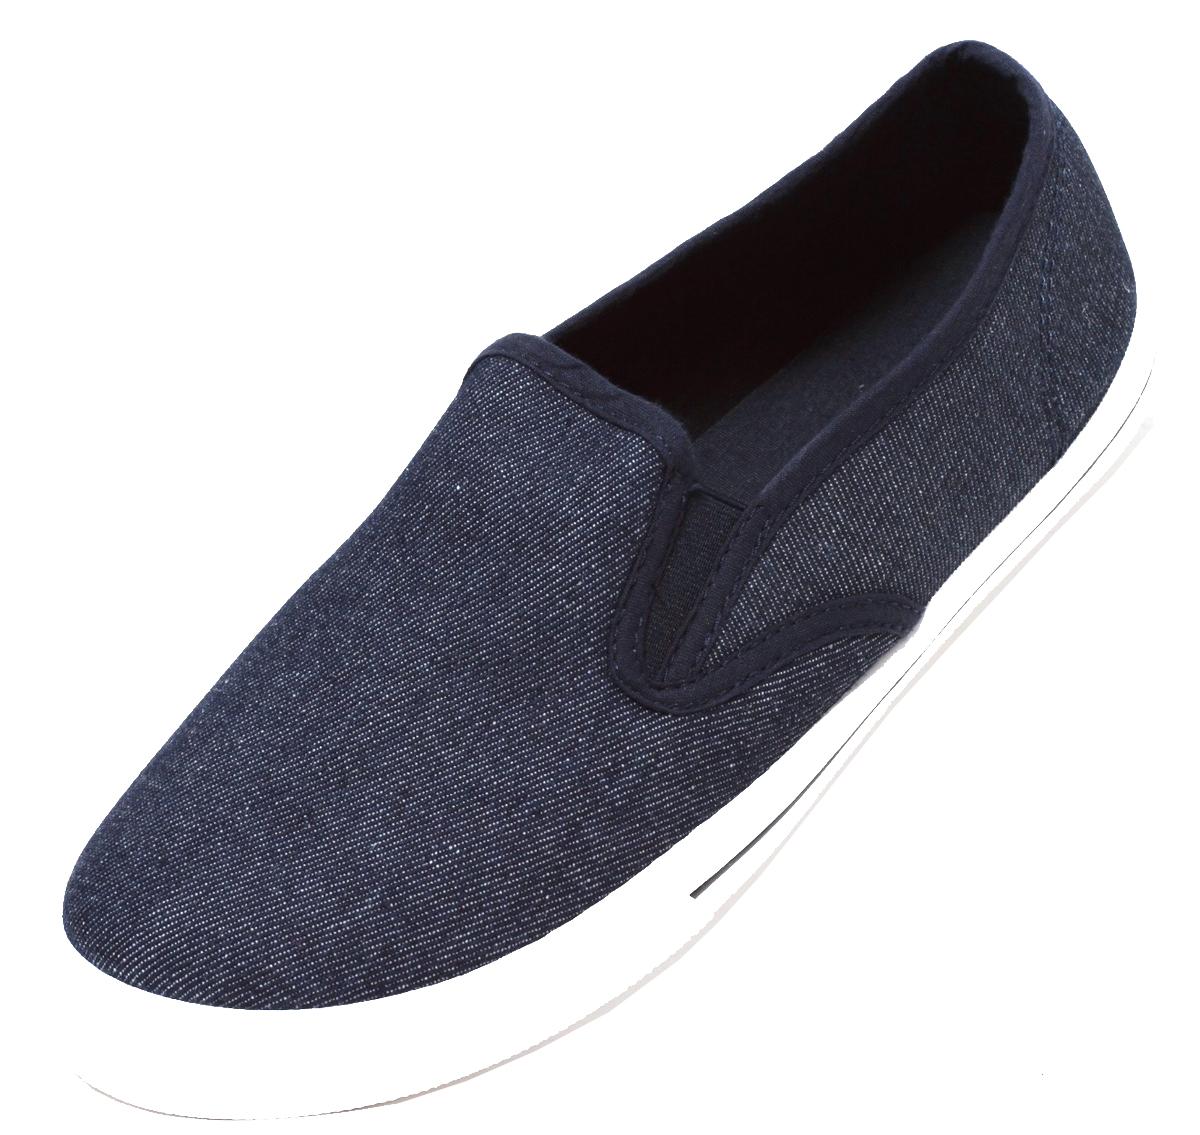 promo code 97f5b e9338 Herren Sneaker Freizeitsneaker Canvas Slipper Slip On Jeans Schuhe Denim  Blau | dynamic-24.de